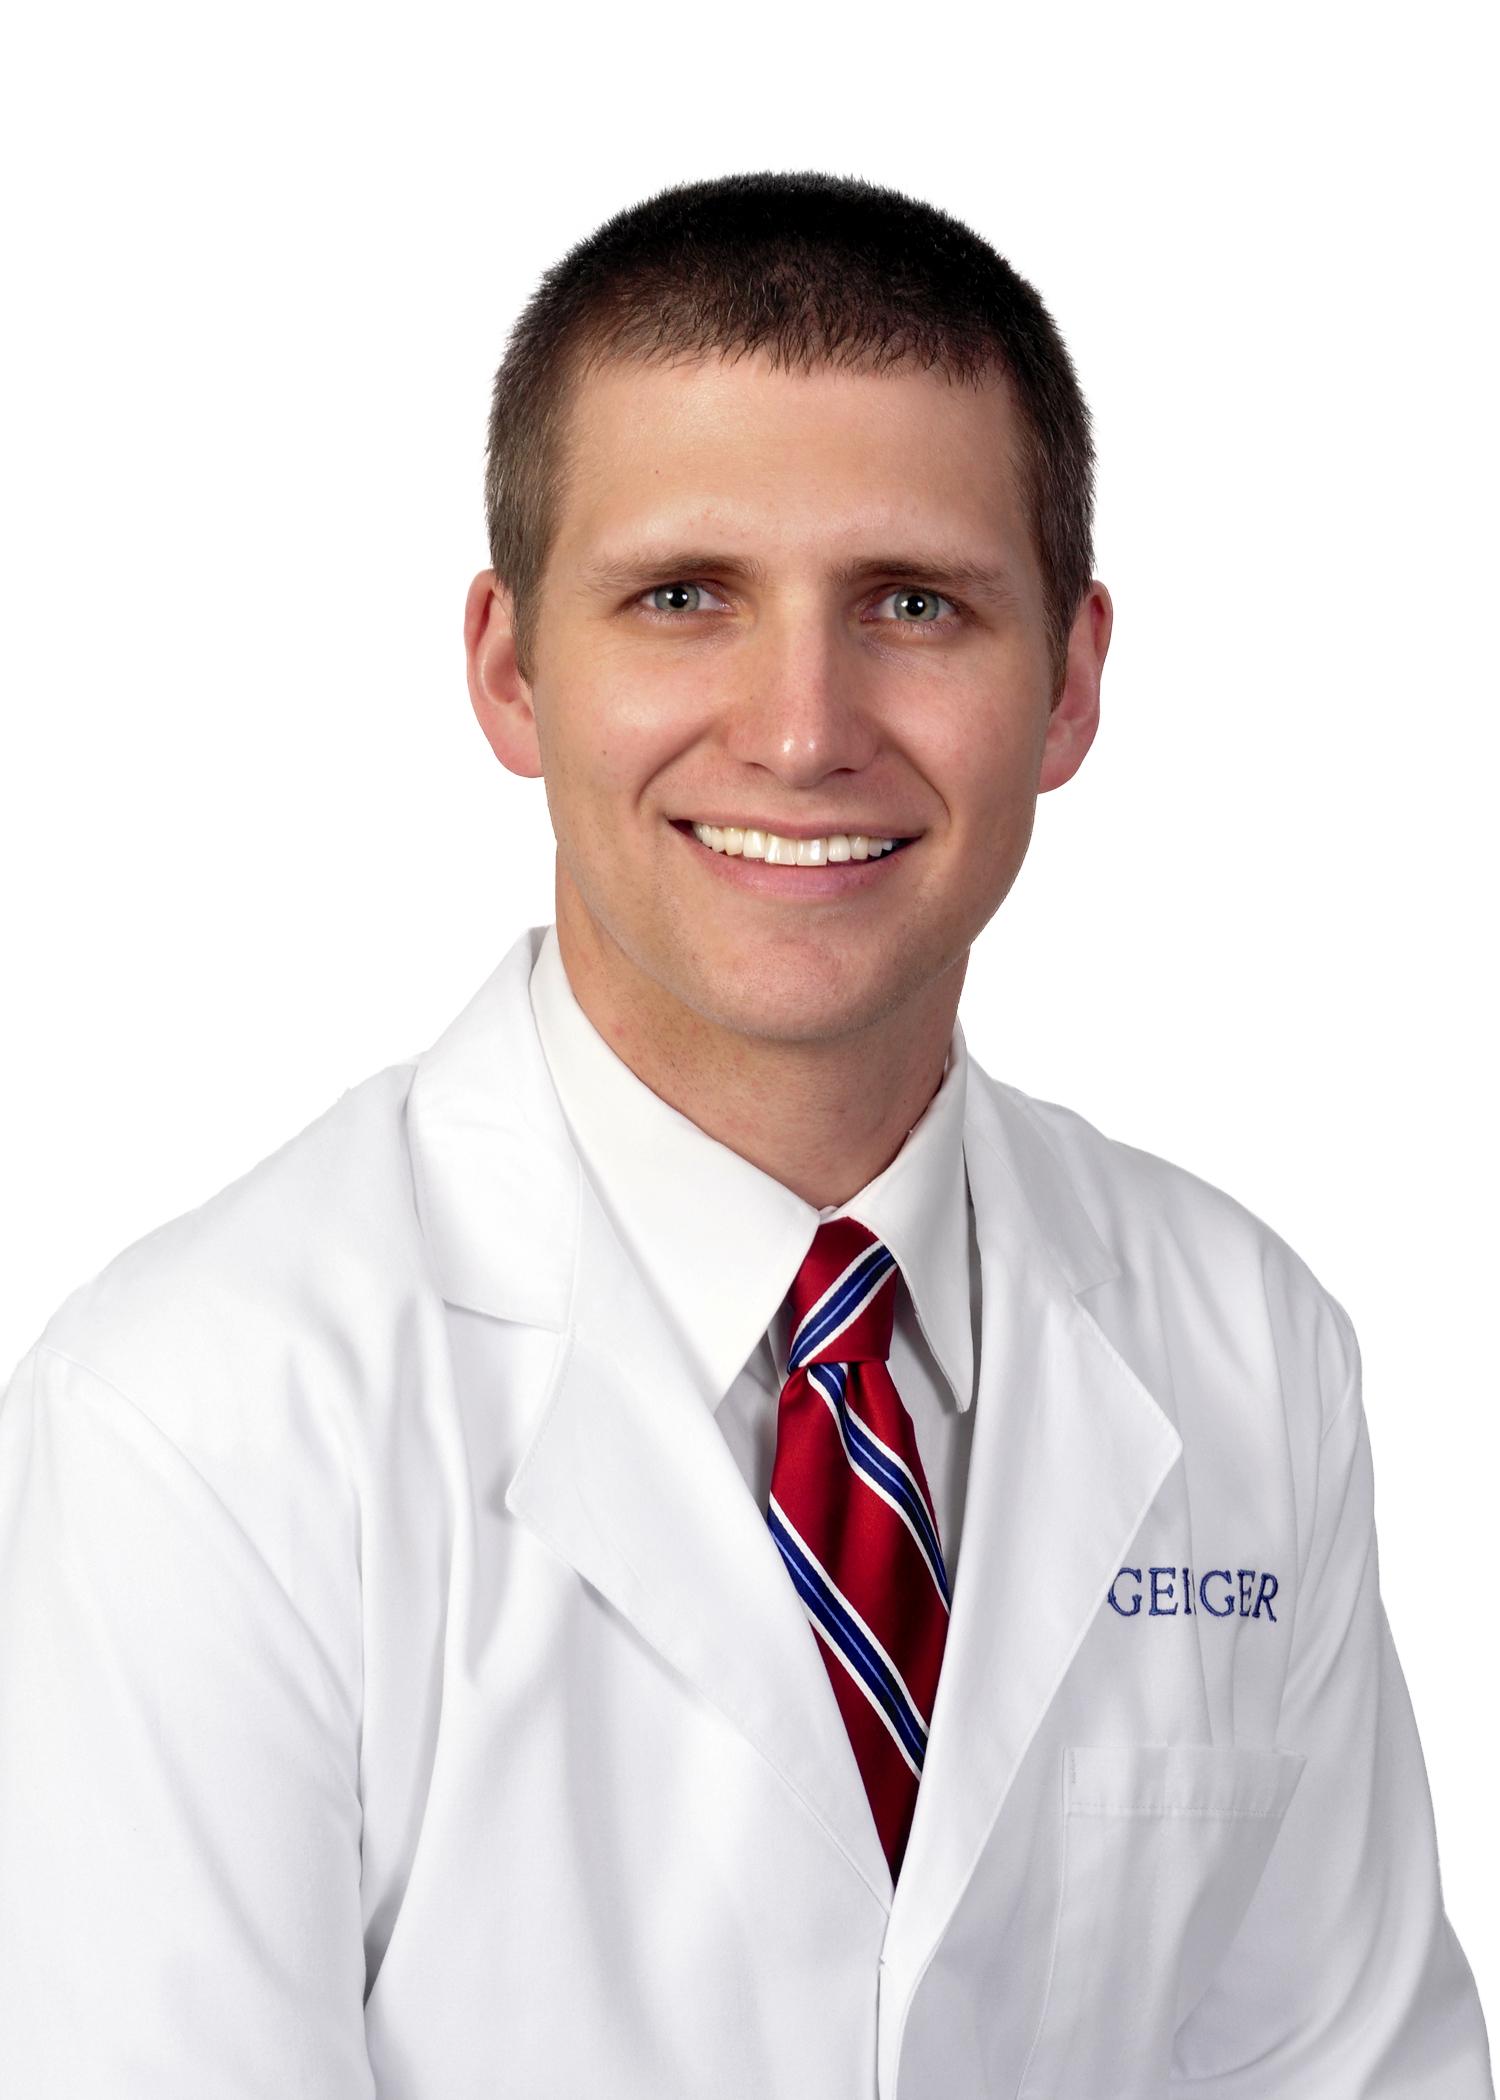 Mohs surgeon joins Geisinger Holy Spirit - Chamber - Carlisle